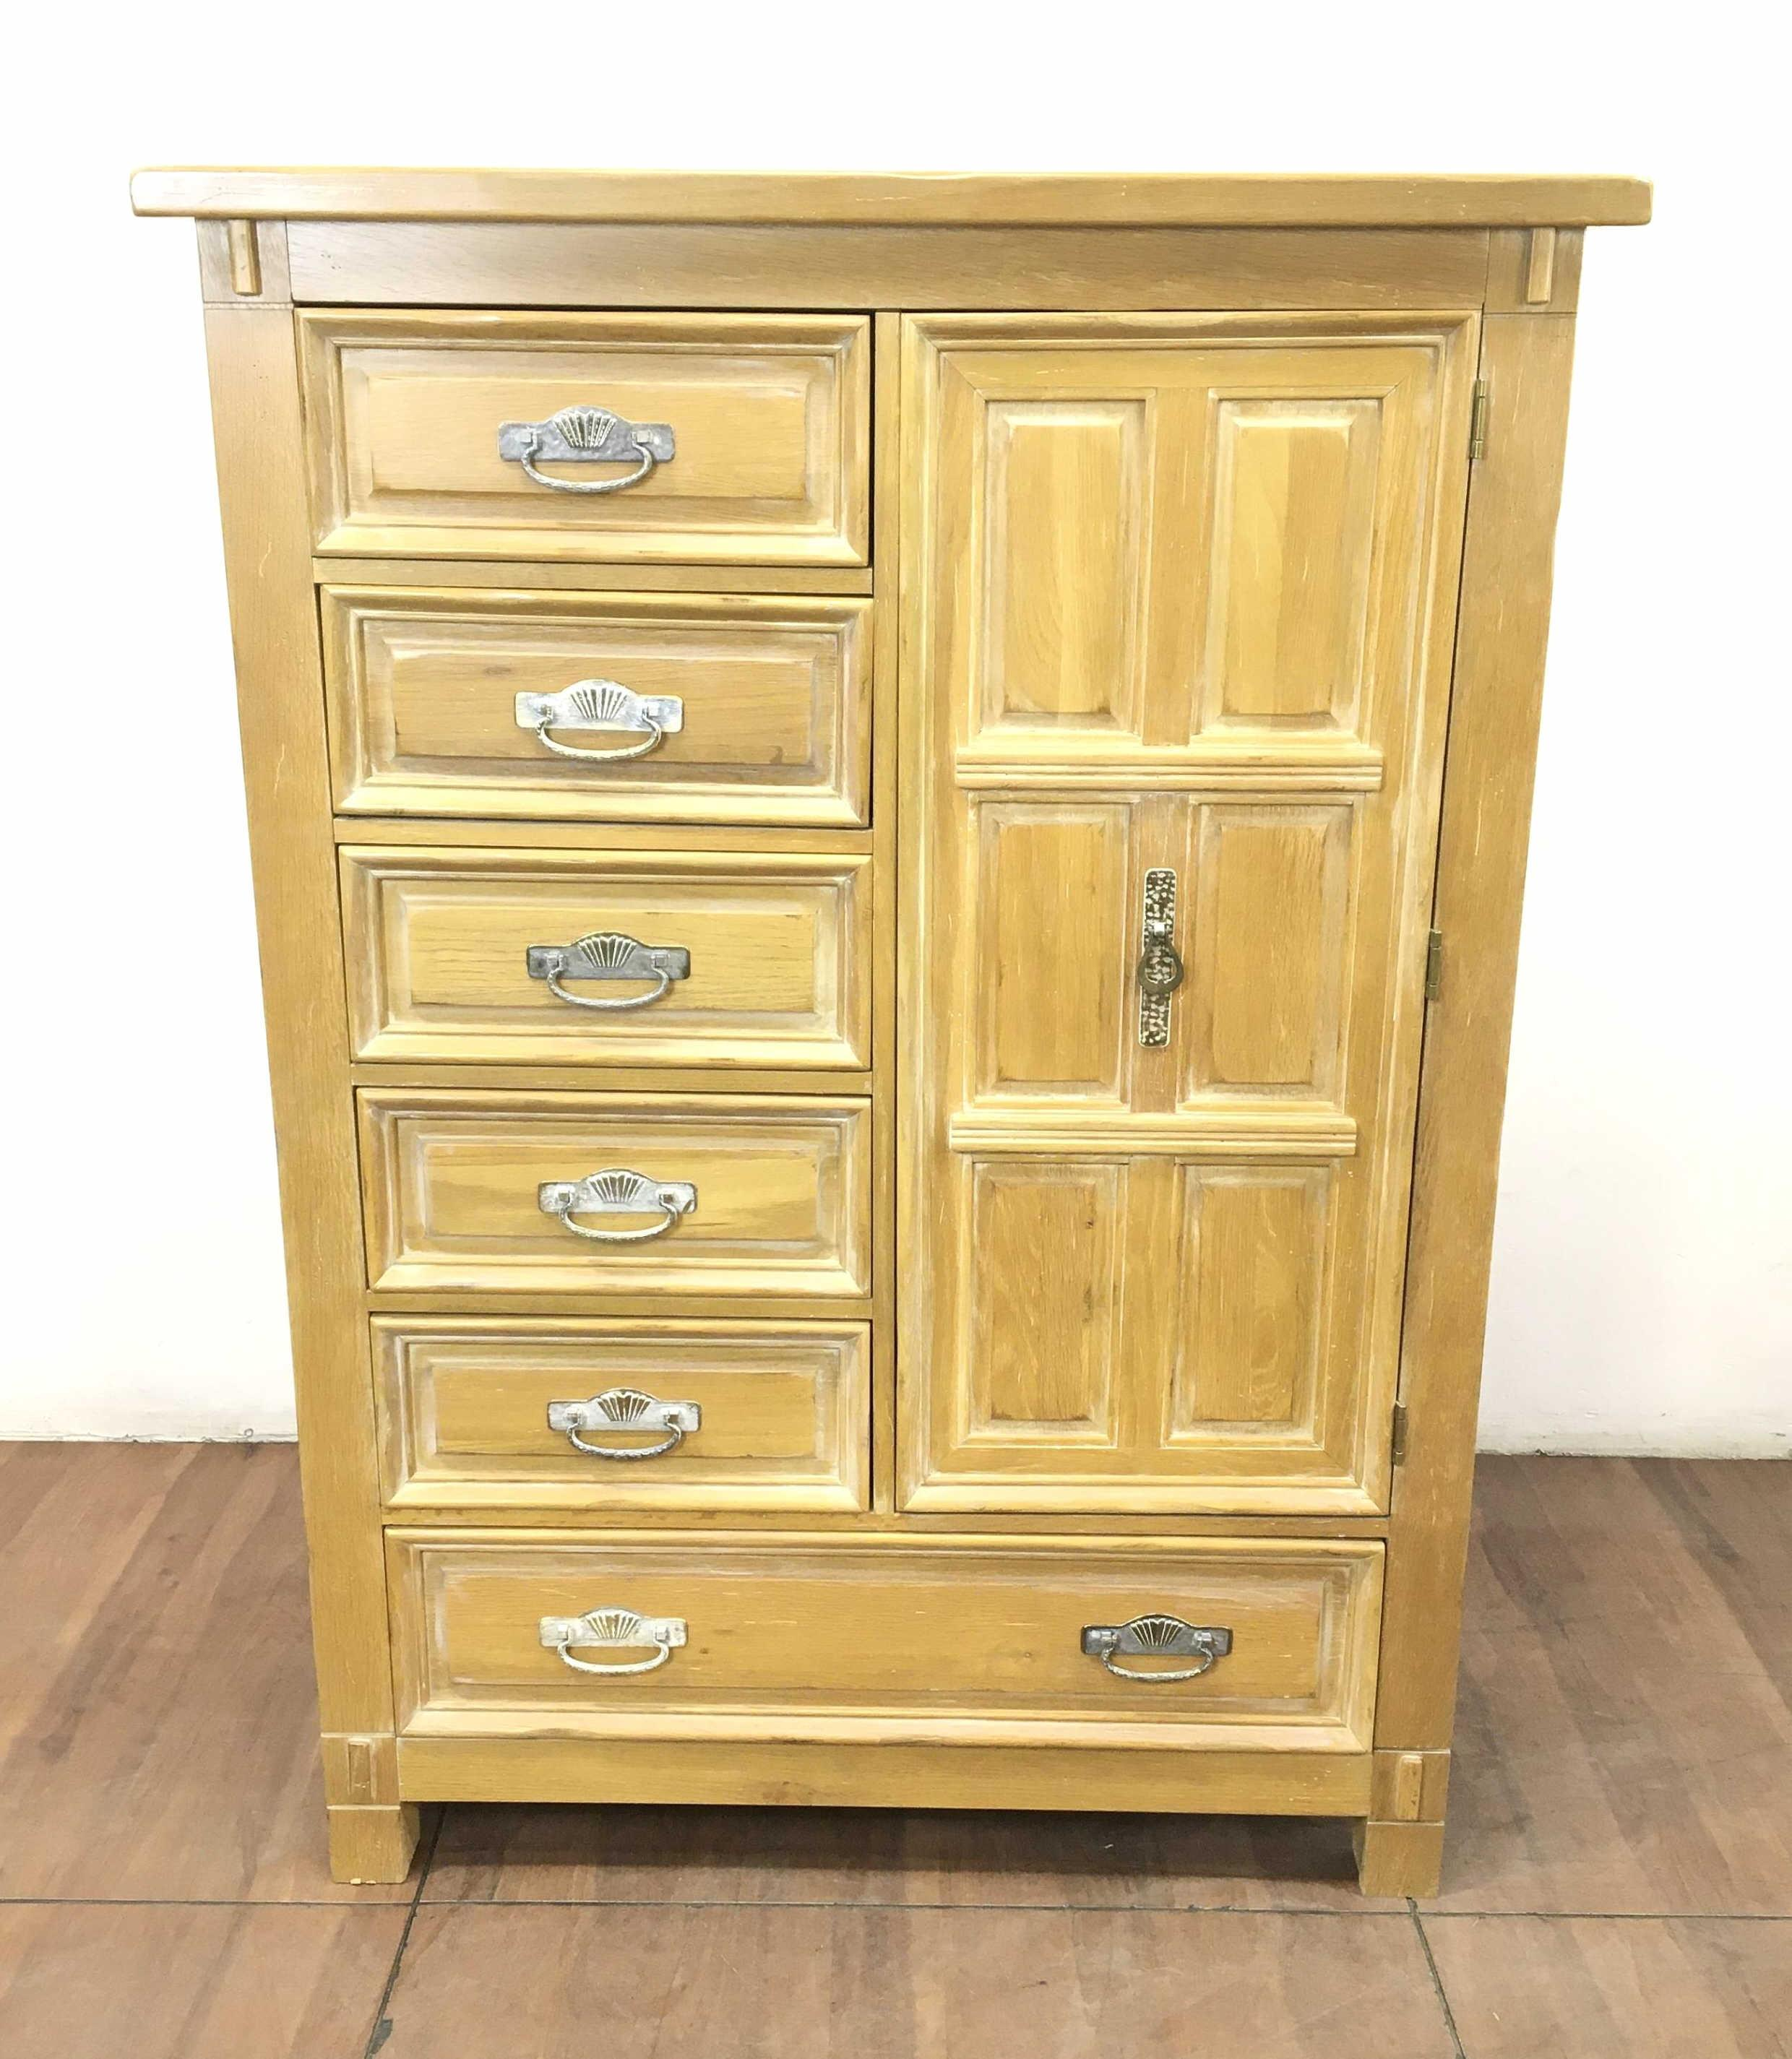 Lexington Link Taylor Taos Collection Oak High Boy Cabinet